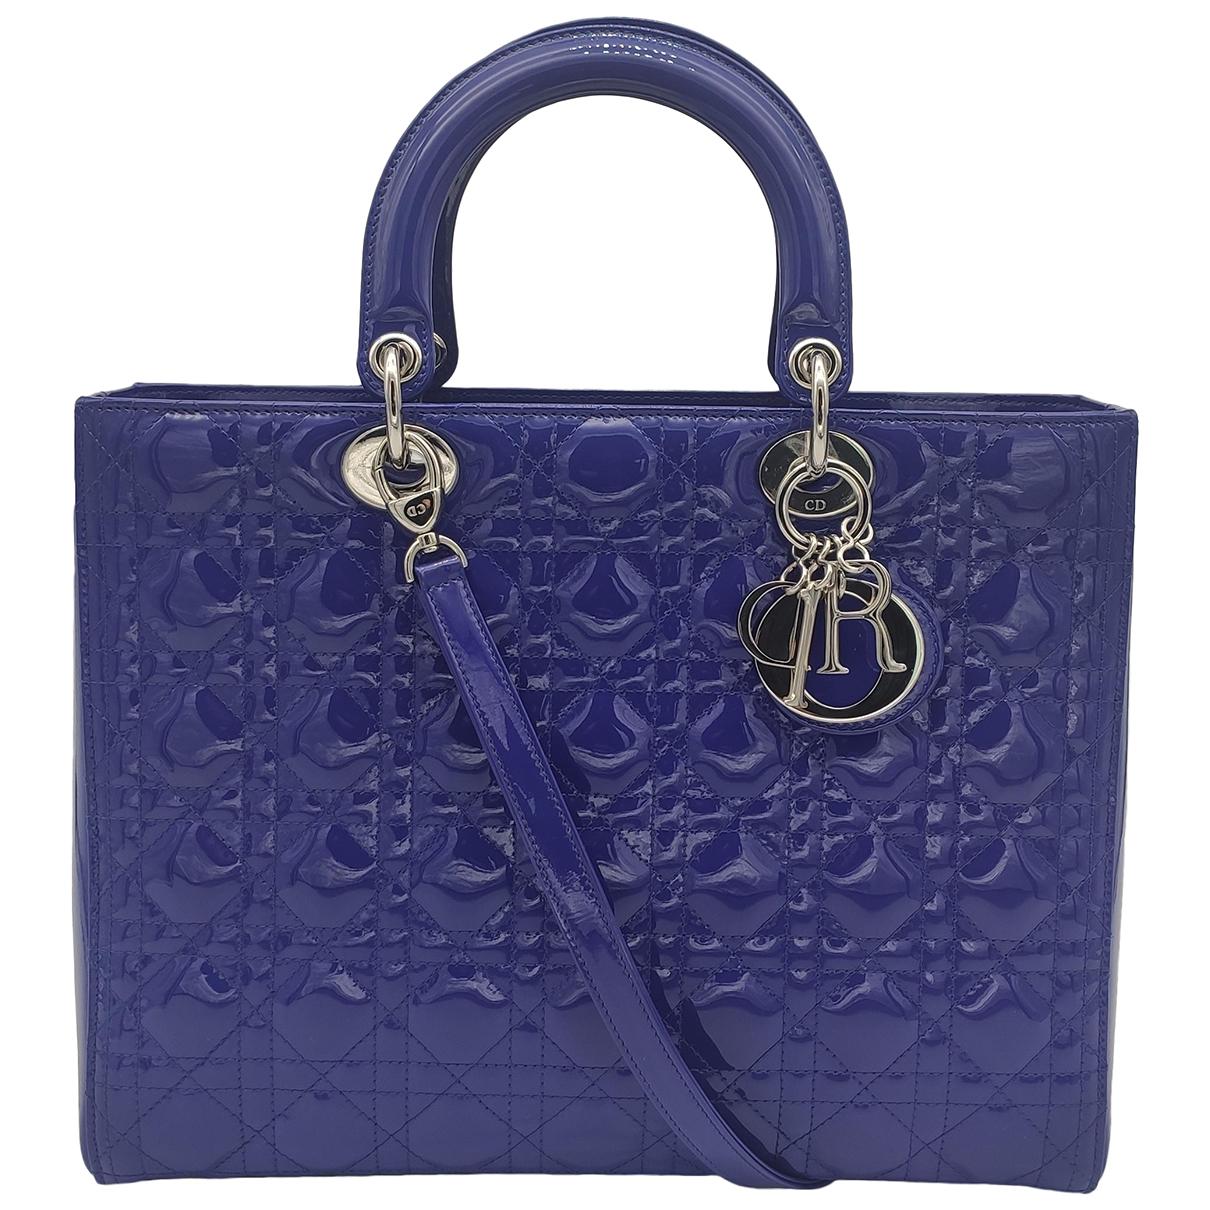 Dior Lady Dior Purple Patent leather handbag for Women N